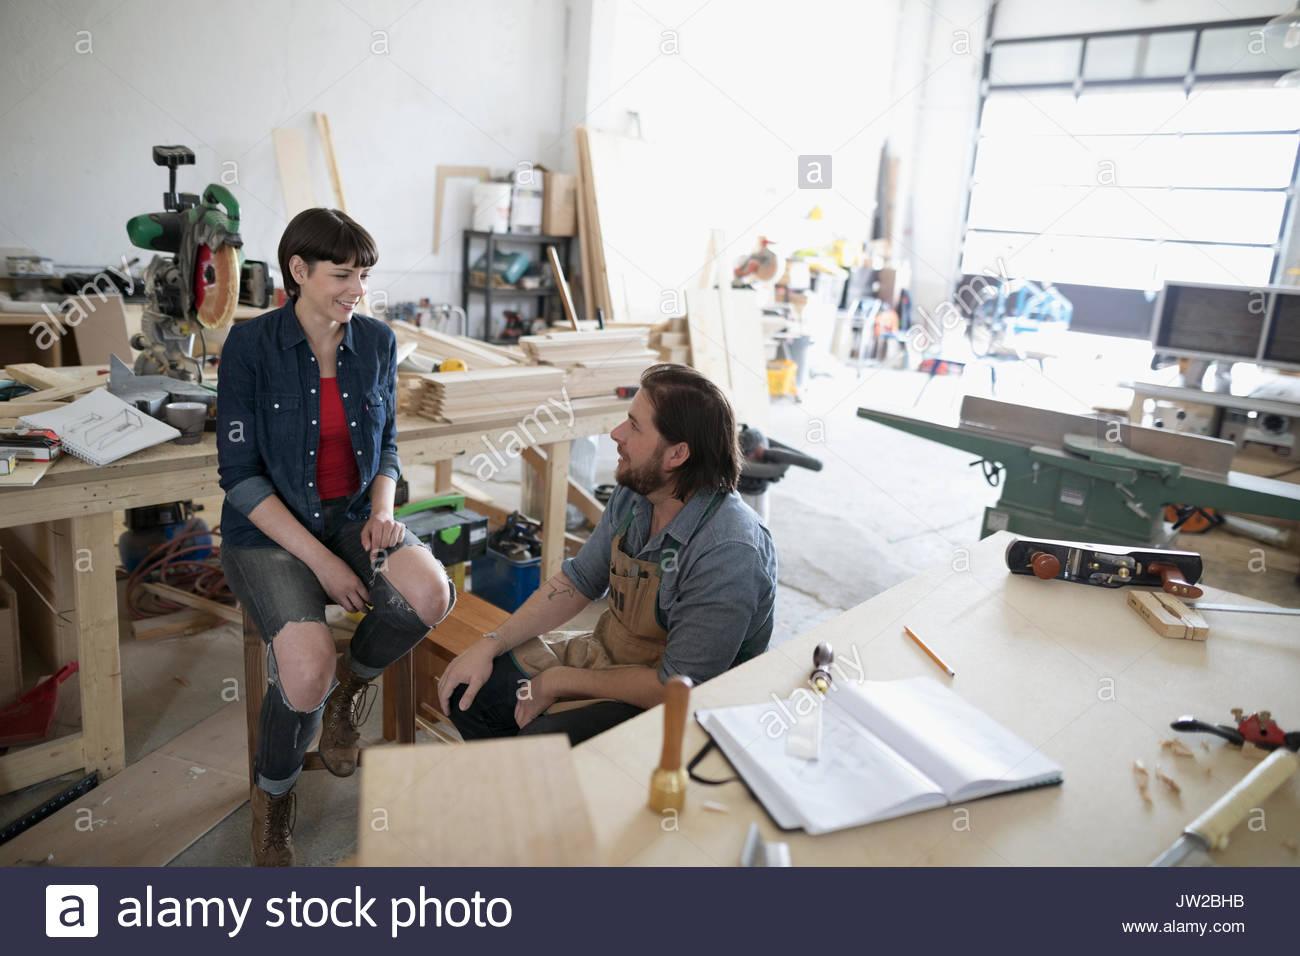 Carpenters talking in workshop - Stock Image